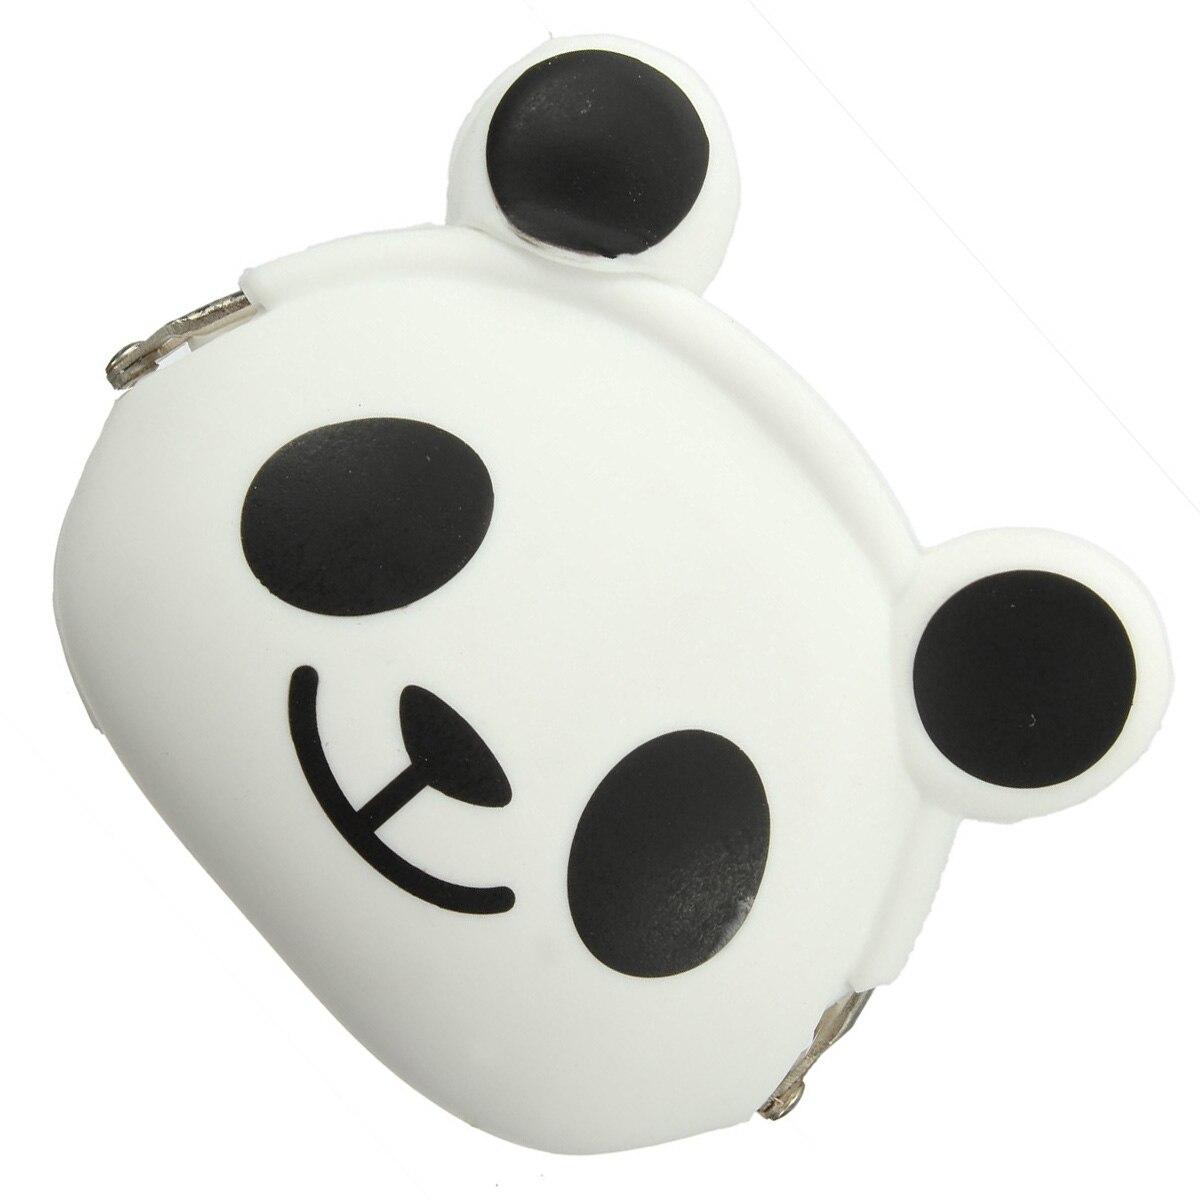 5) Women Girls Wallet Kawaii Cute Cartoon Animal Silicone Jelly Coin Bag Purse Kids Gift Panda